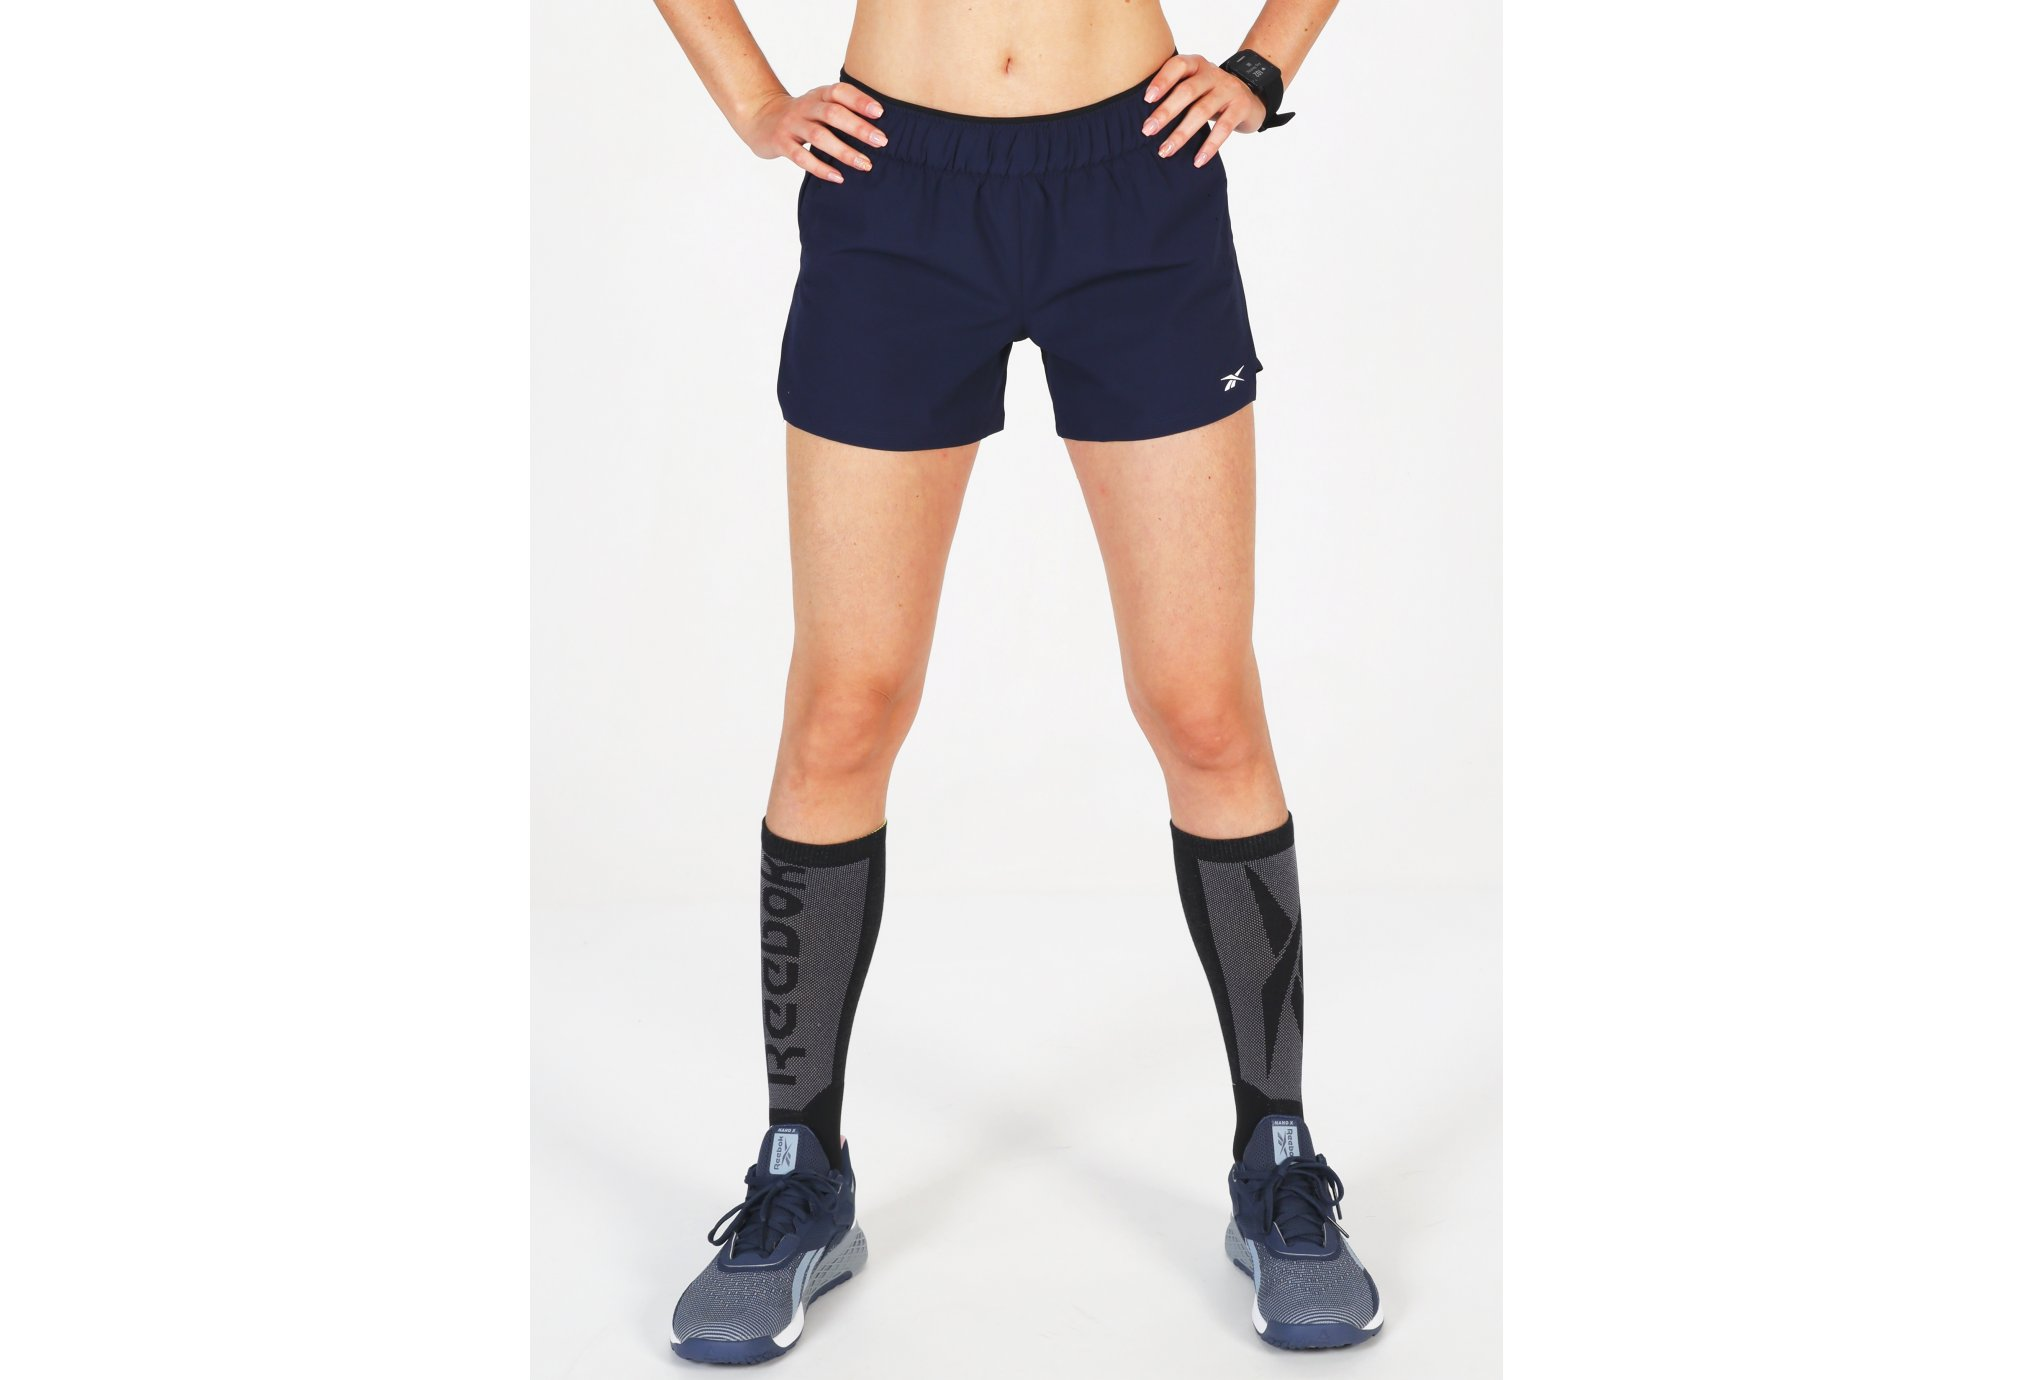 Reebok Epic United By Fitness W vêtement running femme